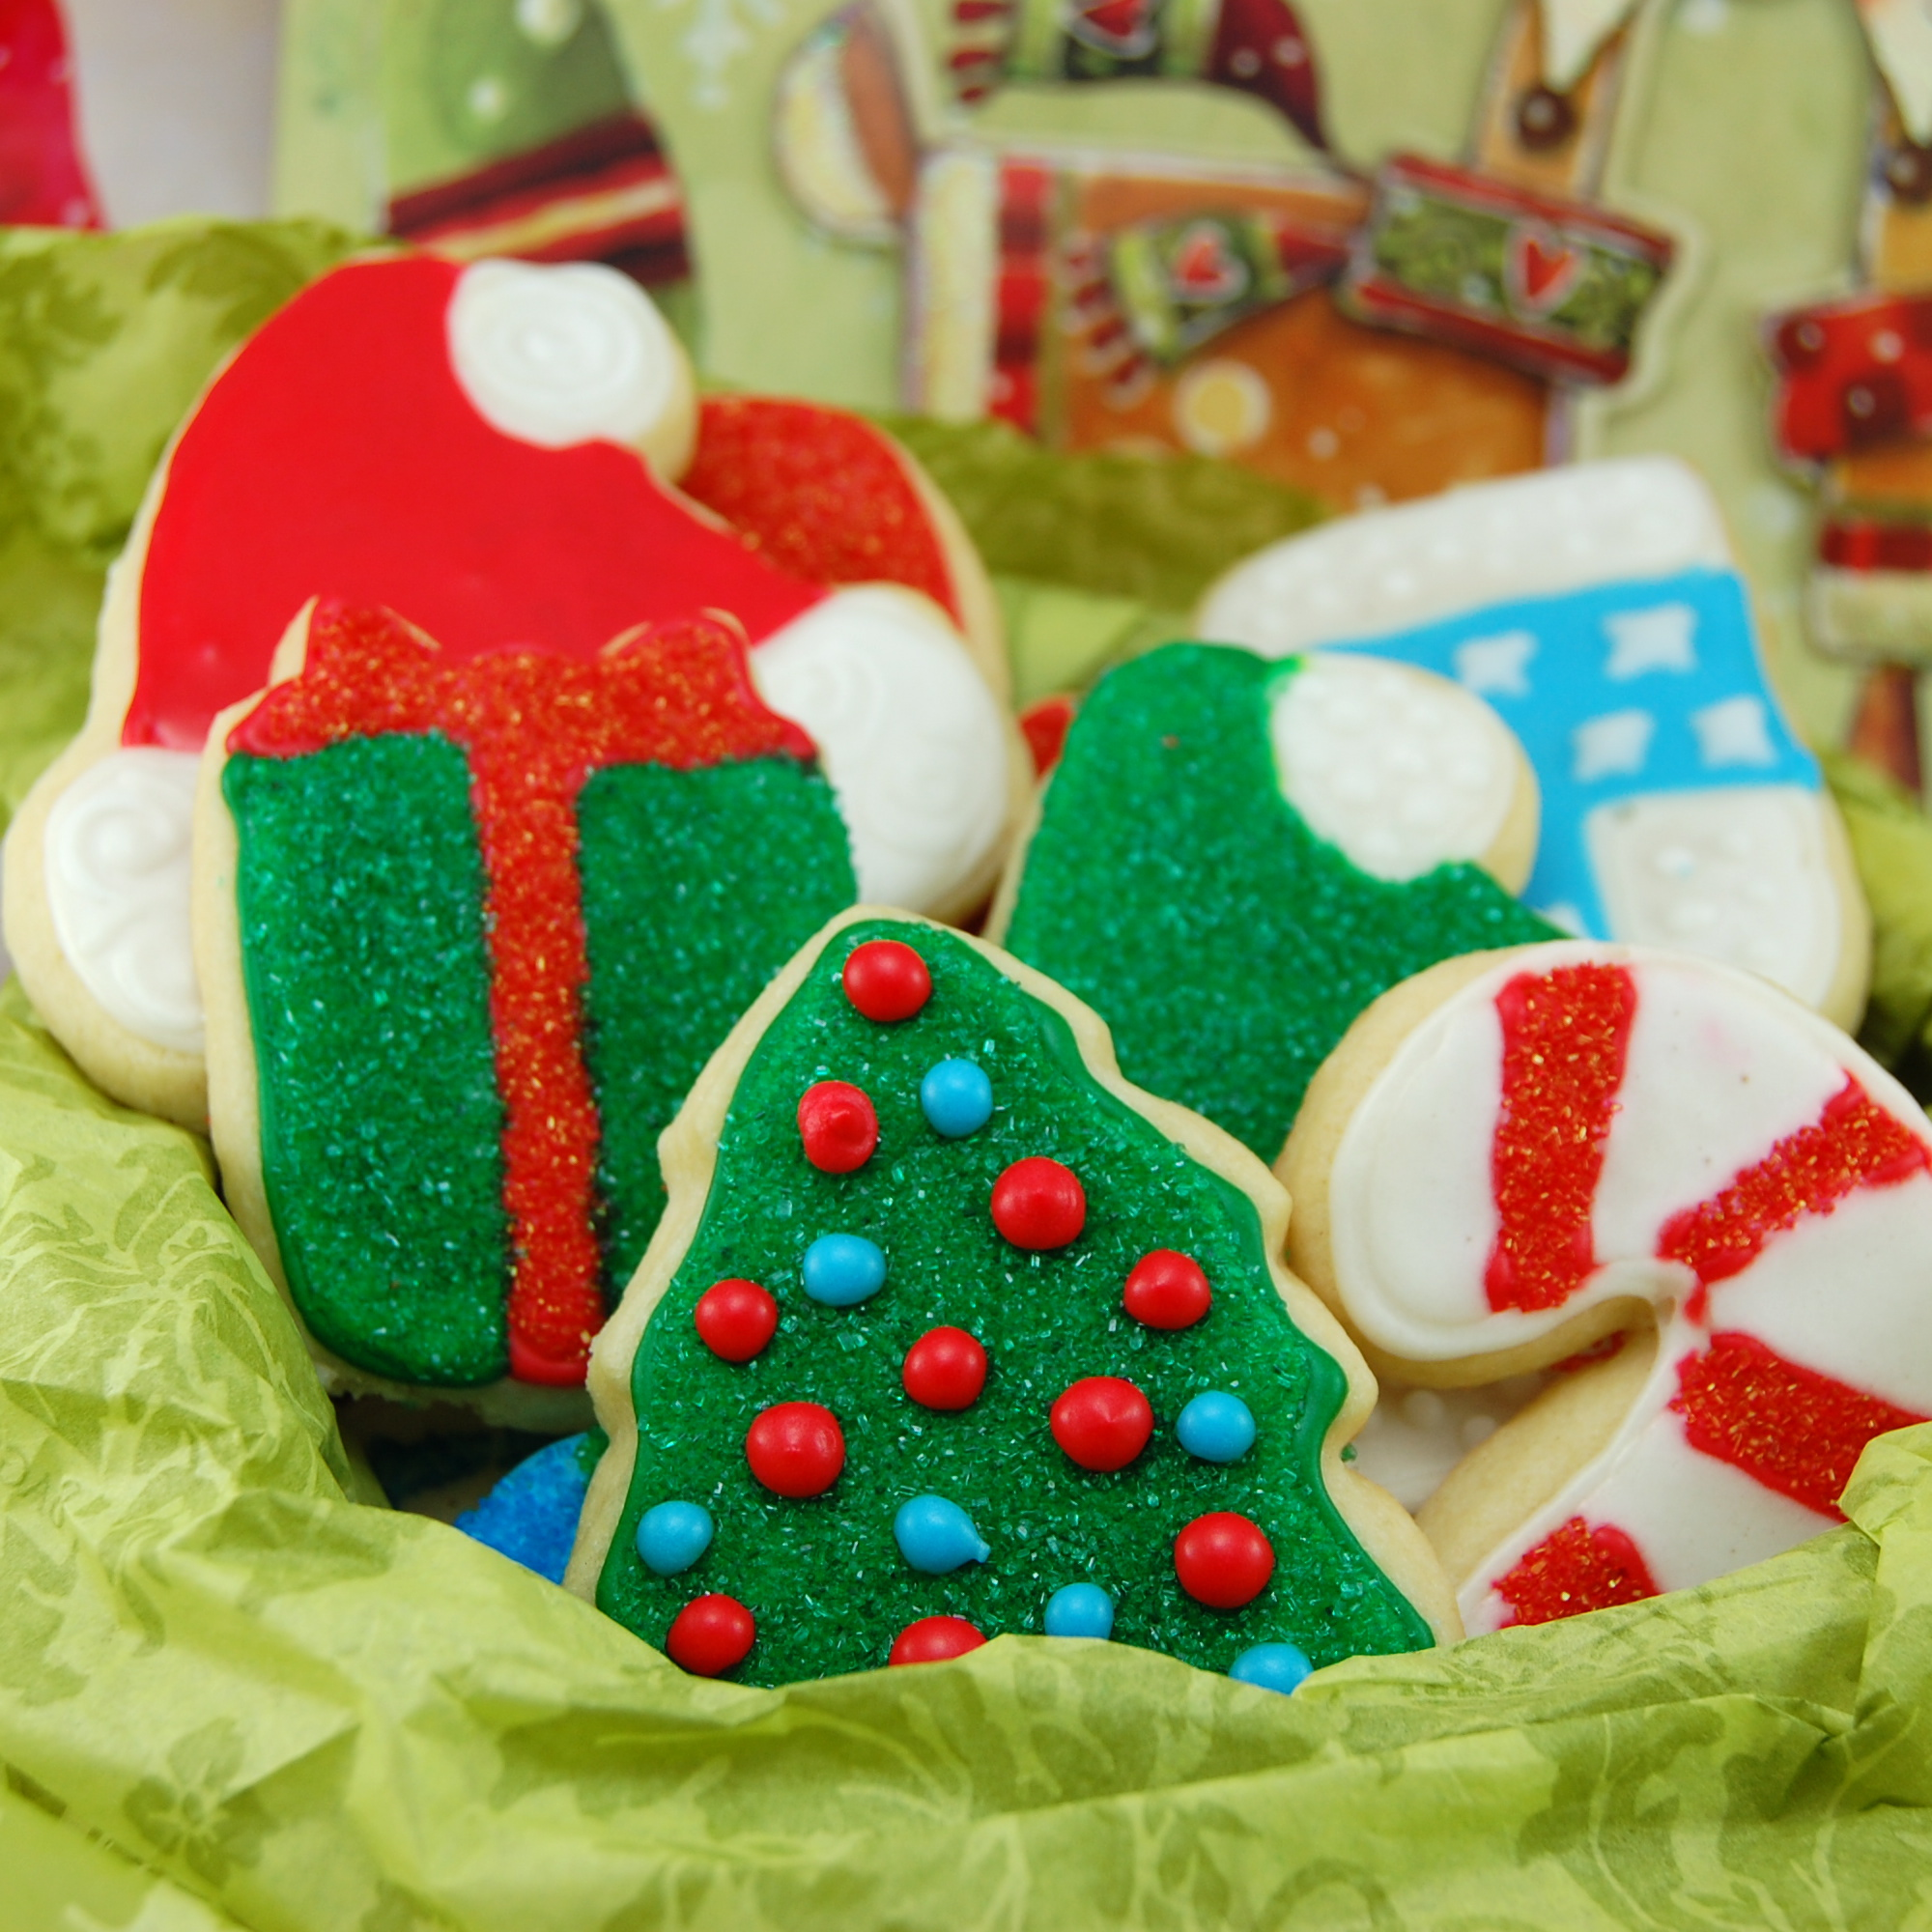 Sweet Pea's Kitchen » Christmas Sugar Cookies